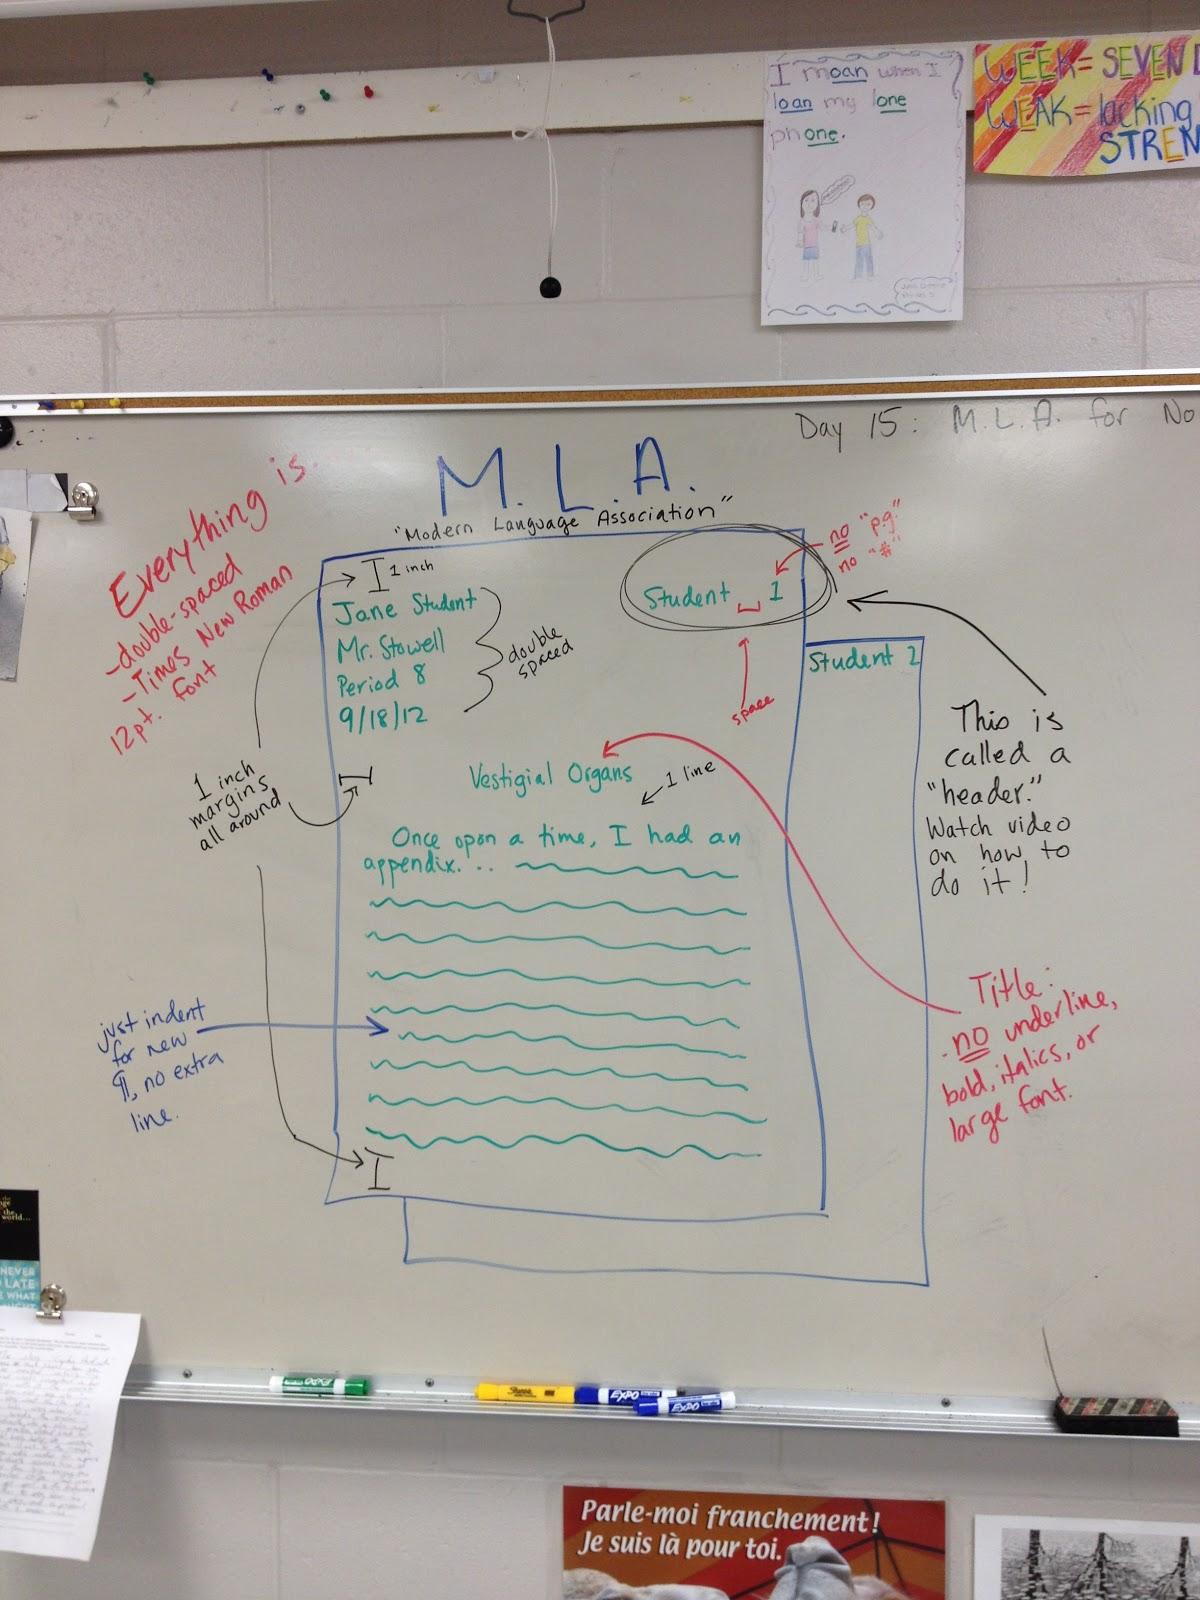 Tsunami English Class Mla Format Notes